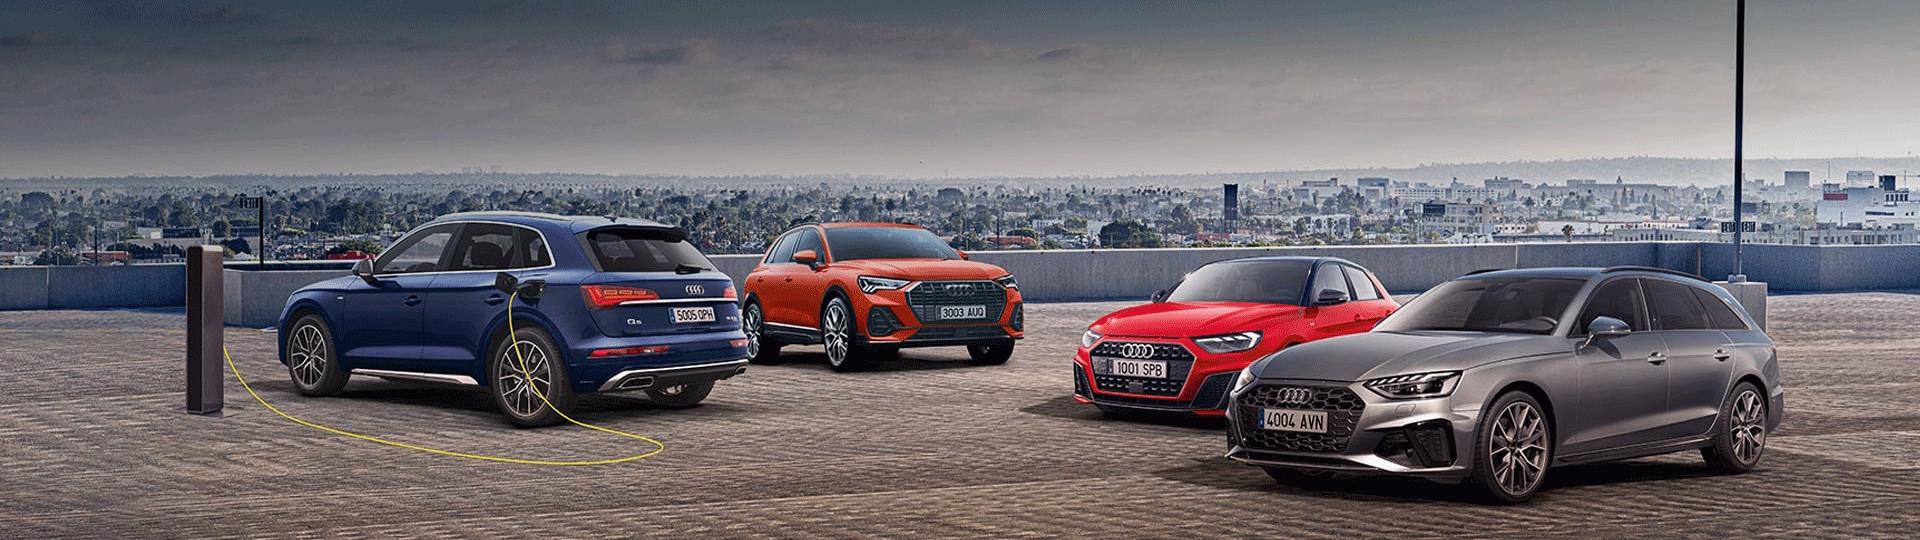 Cabecera-imagen-Time-to-Audi-